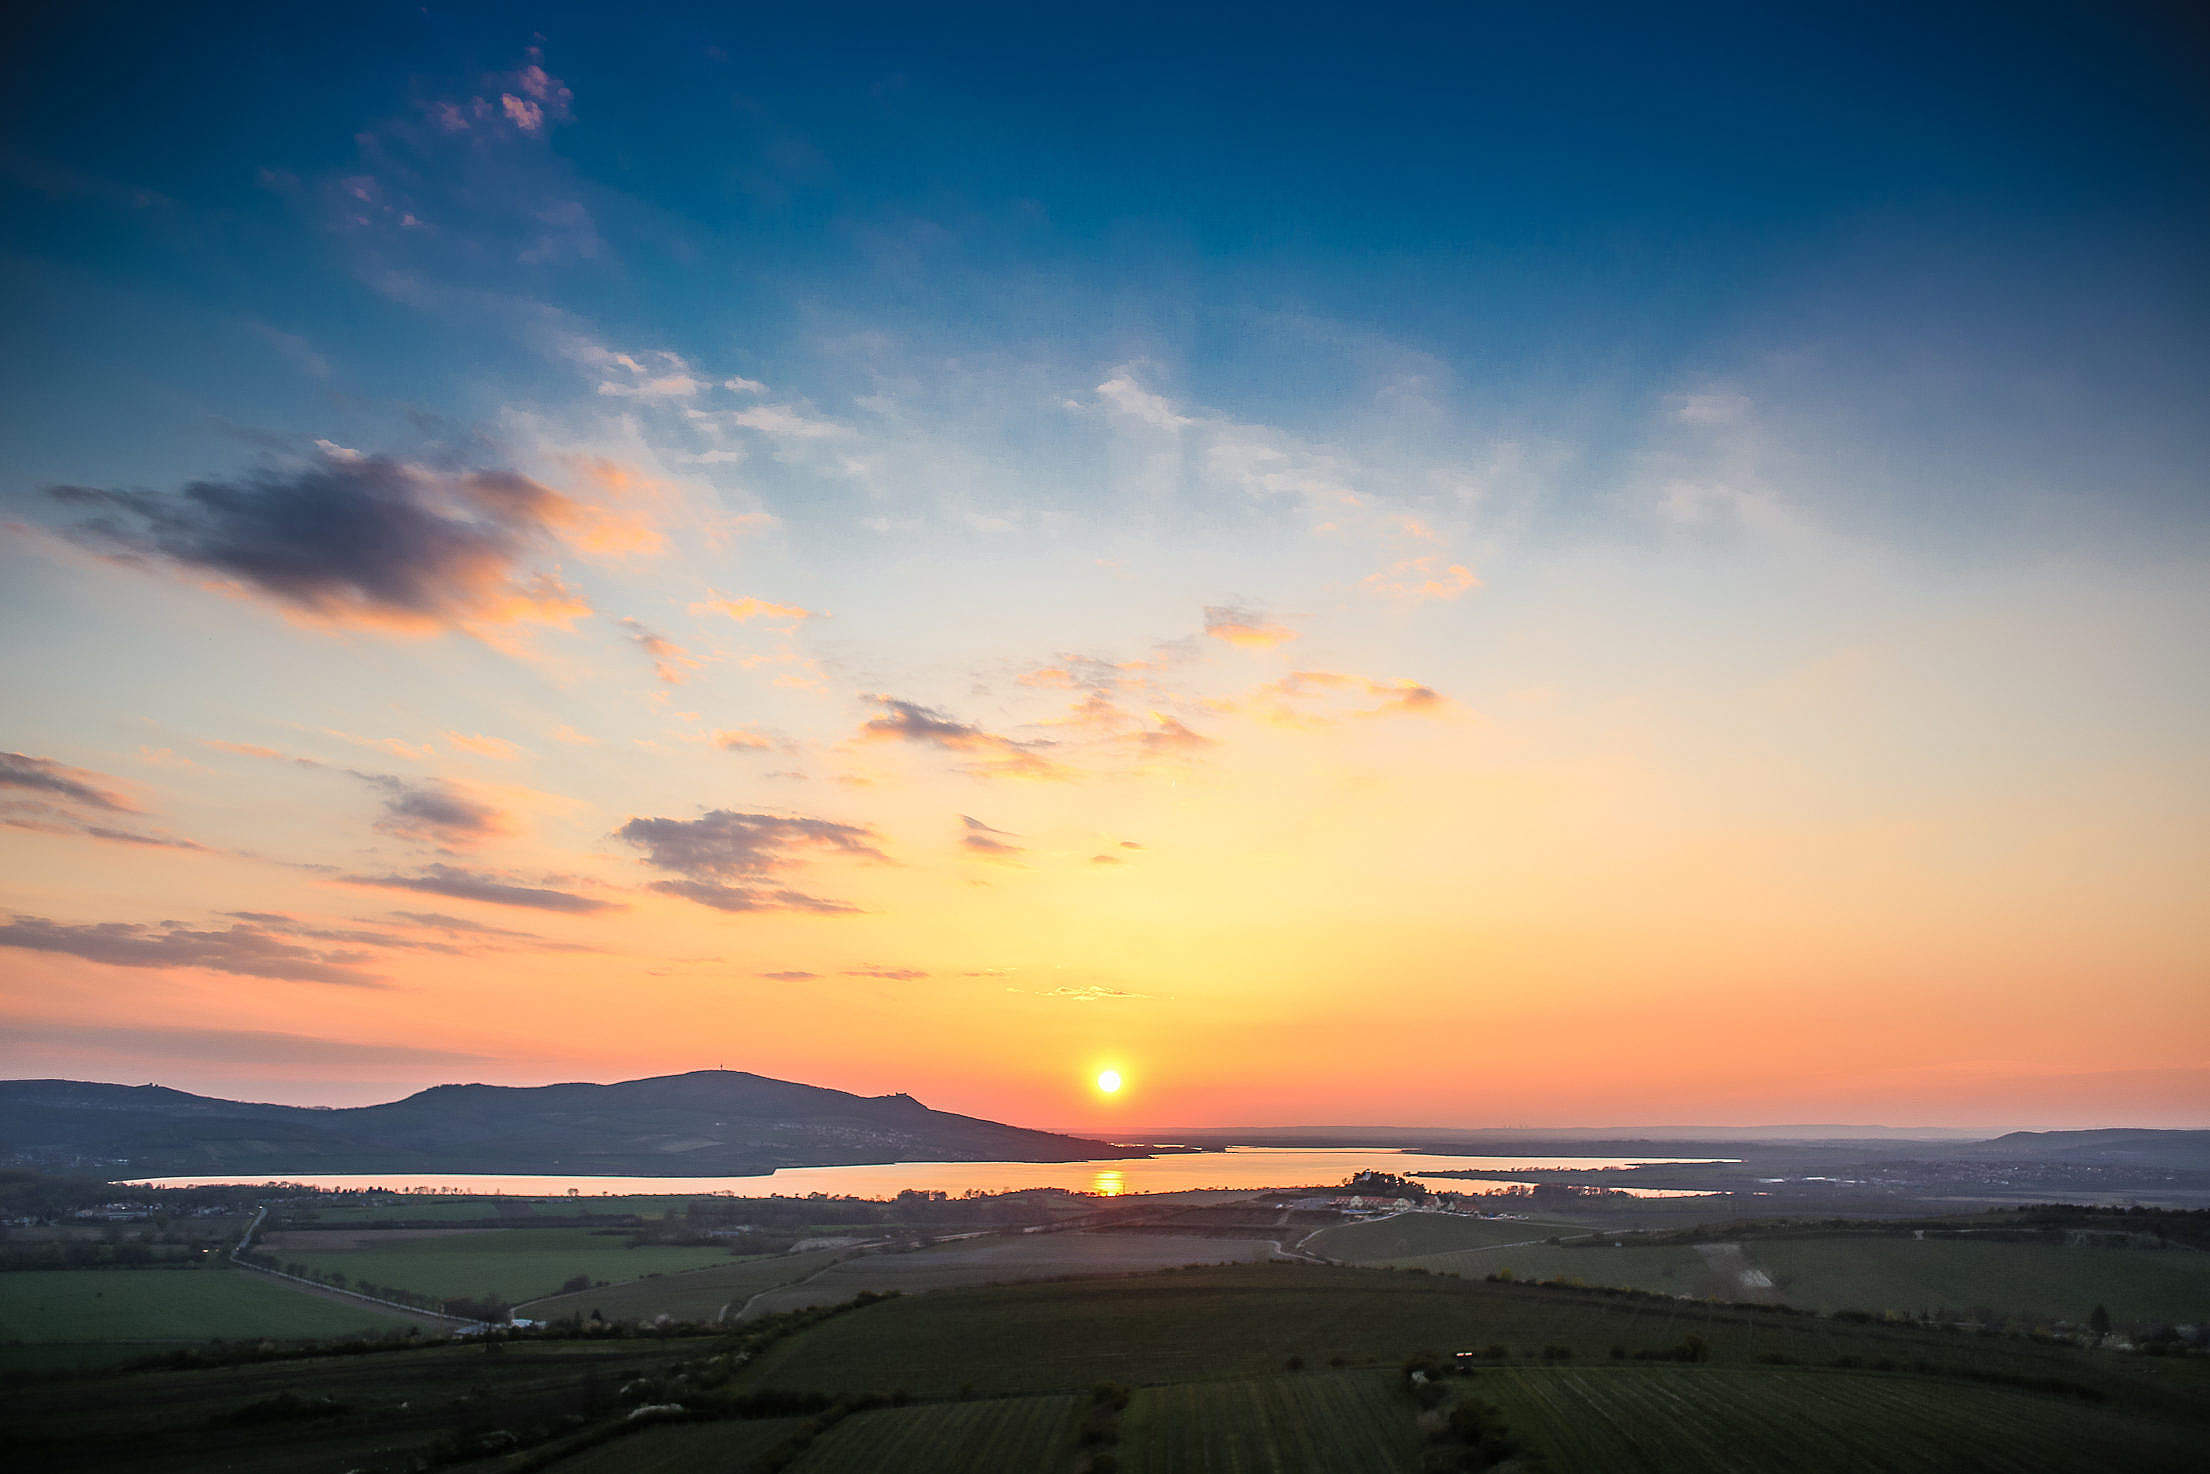 Lake Sunset #2 Free Stock Photo